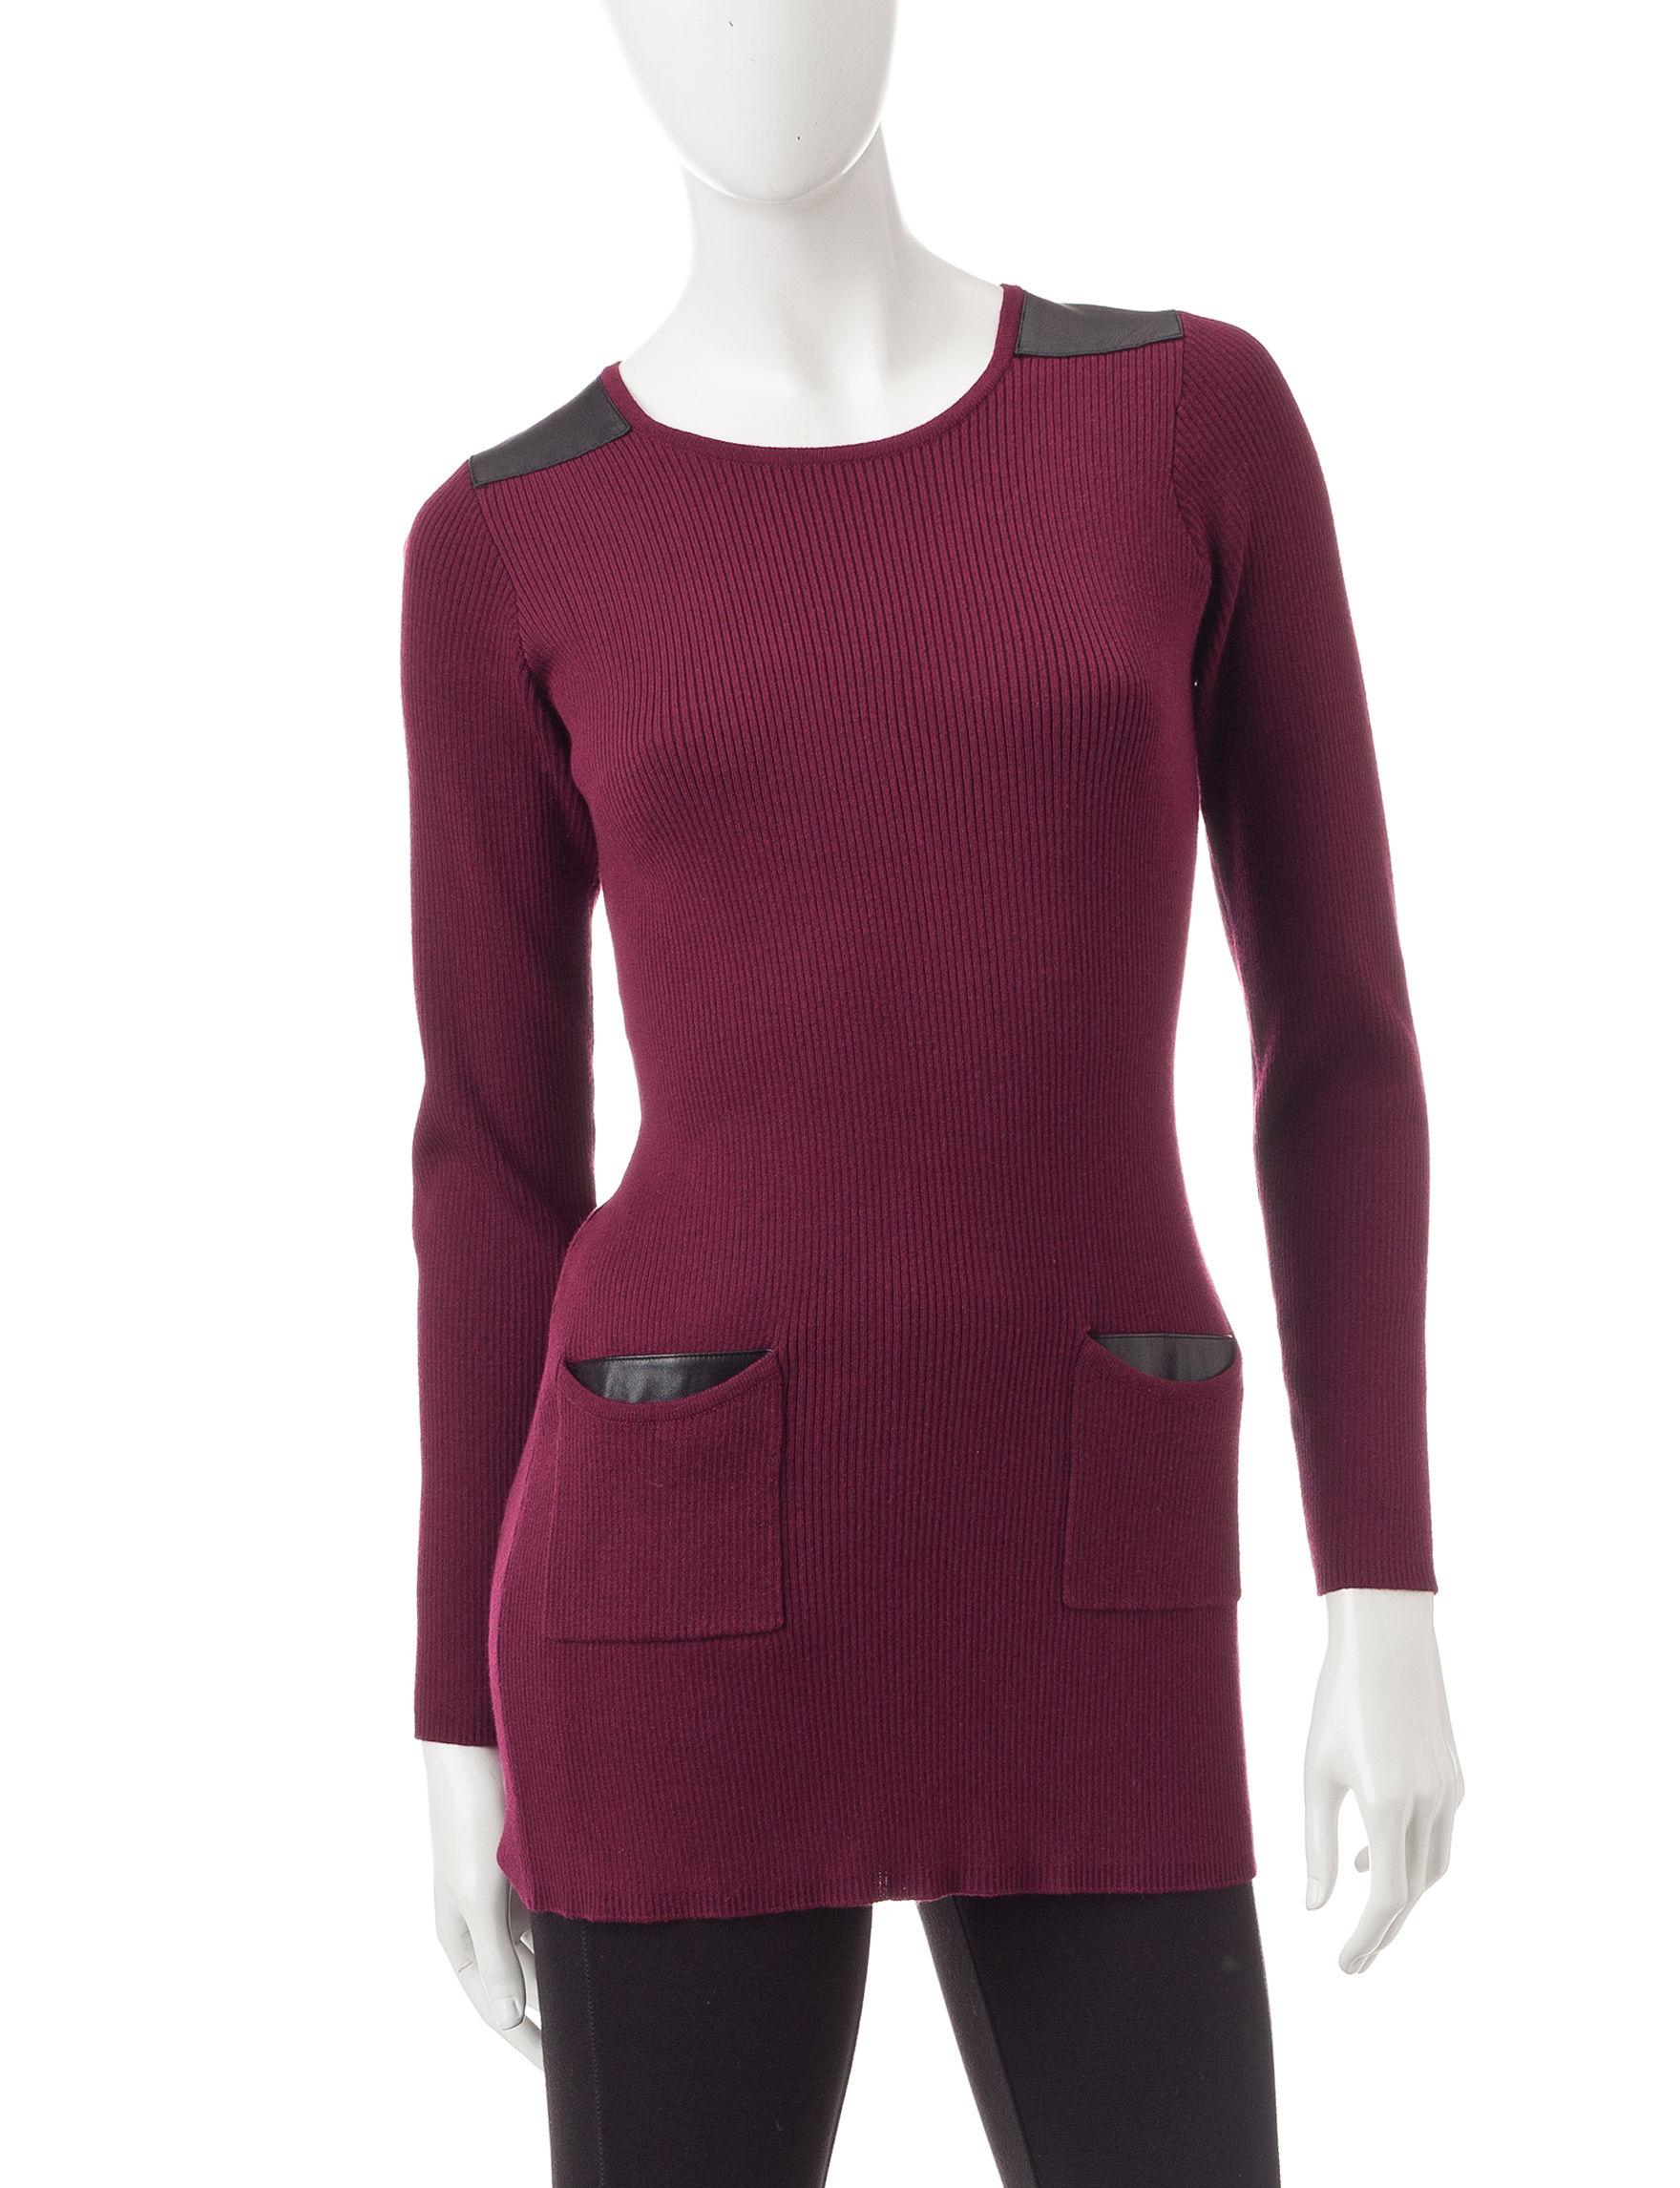 A. Byer Dark Red Sweaters Tunics